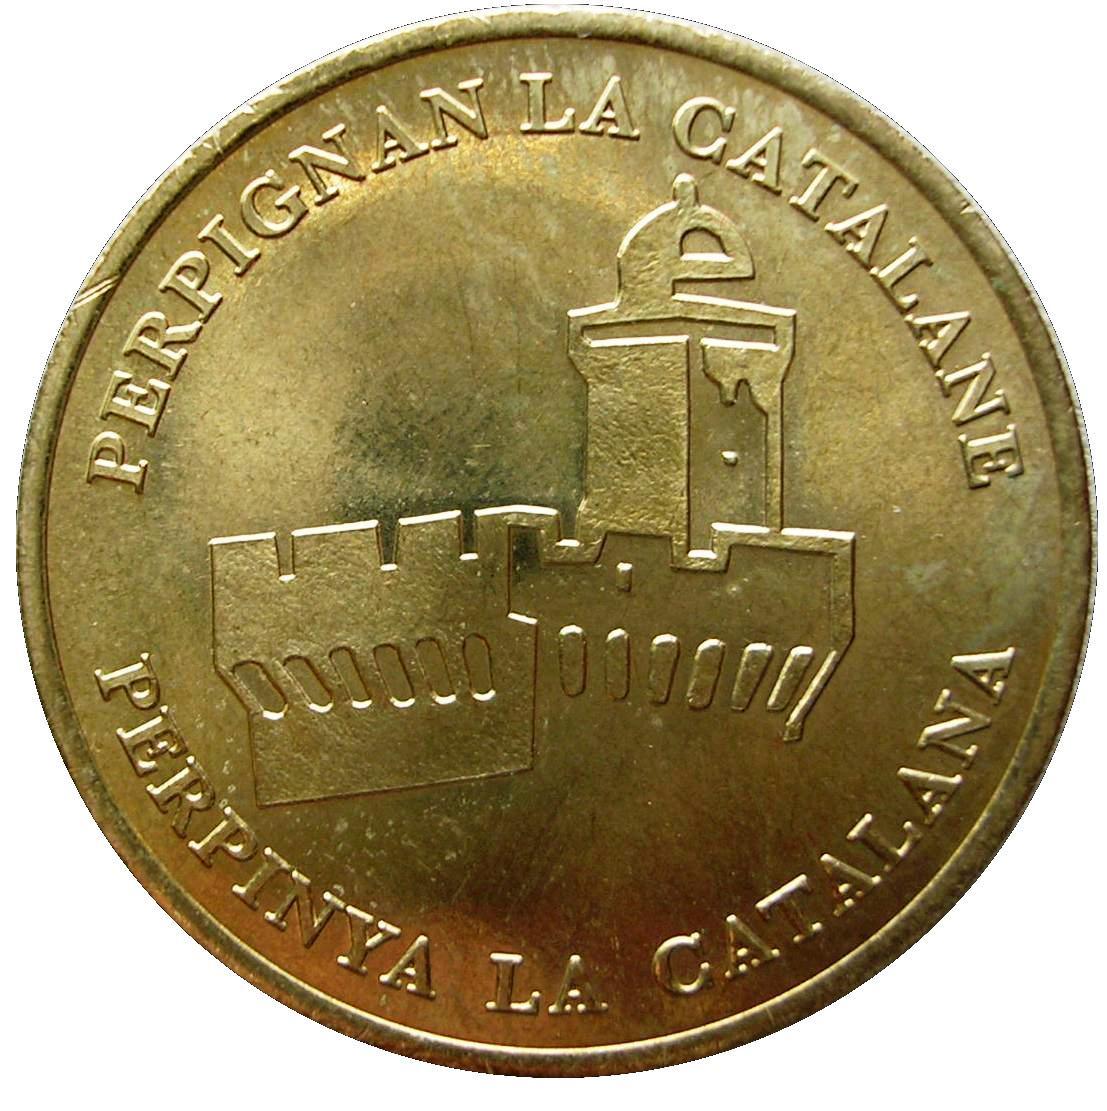 Coin 1 Euro - Perpignan France obverse